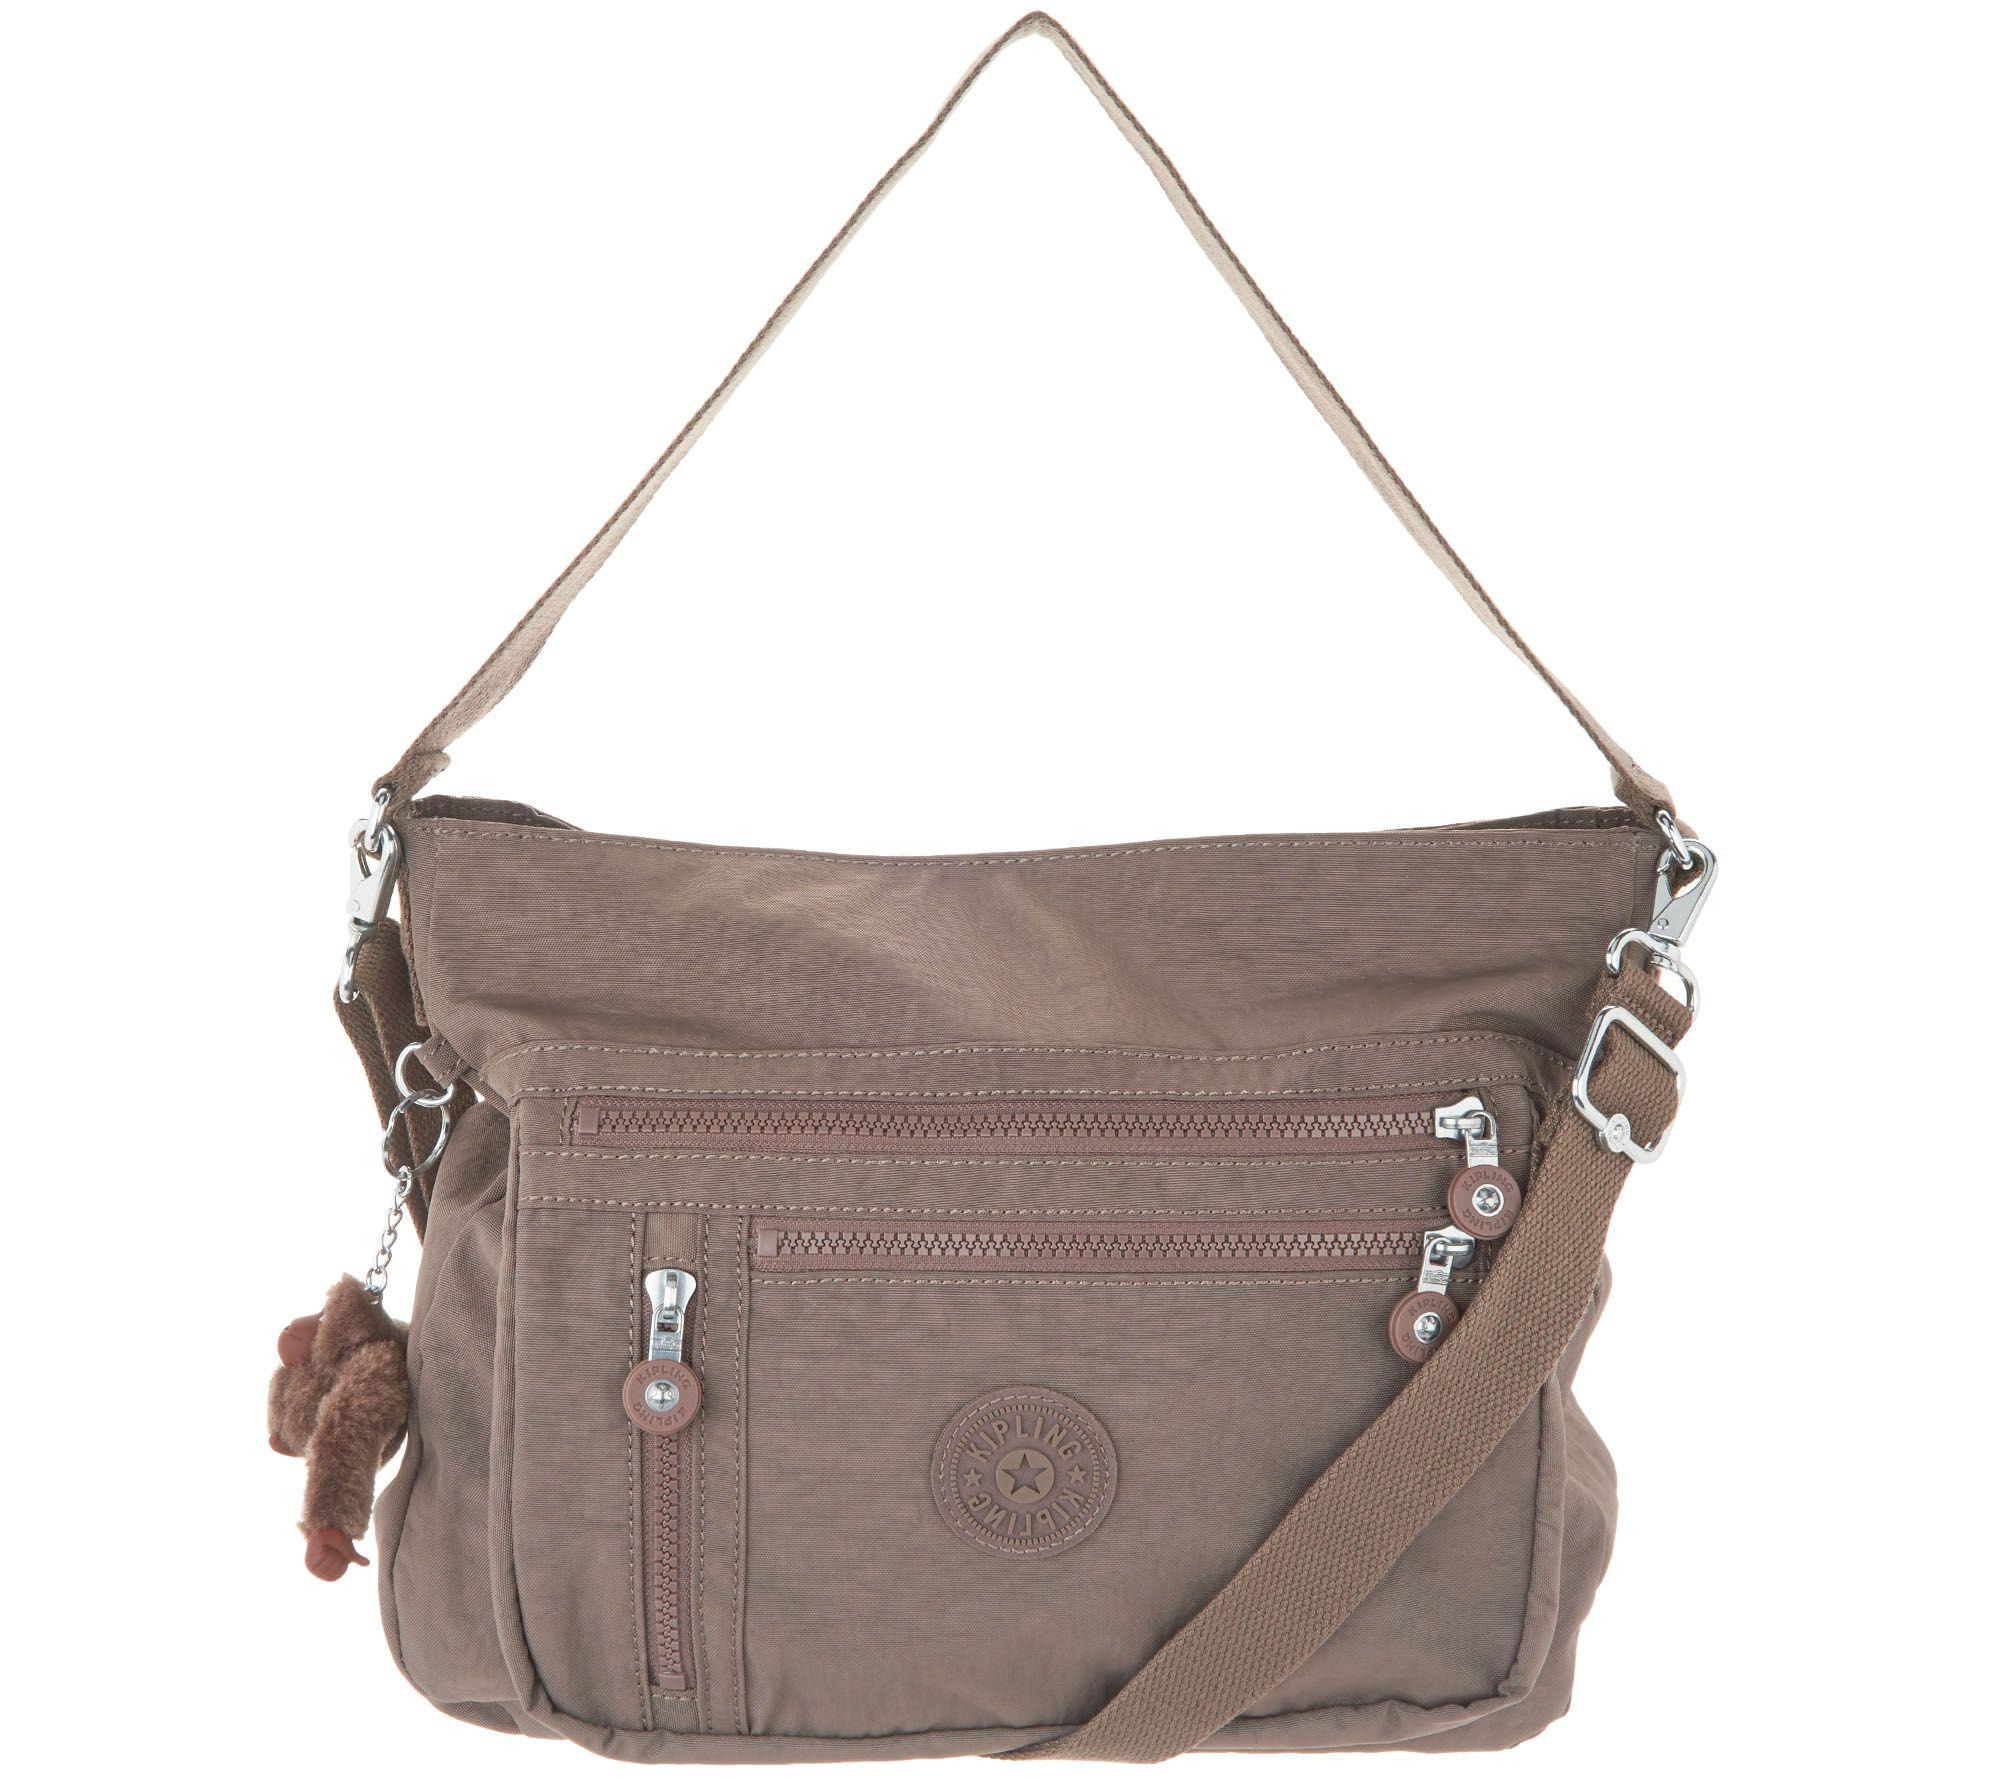 864b5b2f2c Kipling Convertible Shoulder Bag with Crossbody Strap - Teresa - Page 1 —  QVC.com